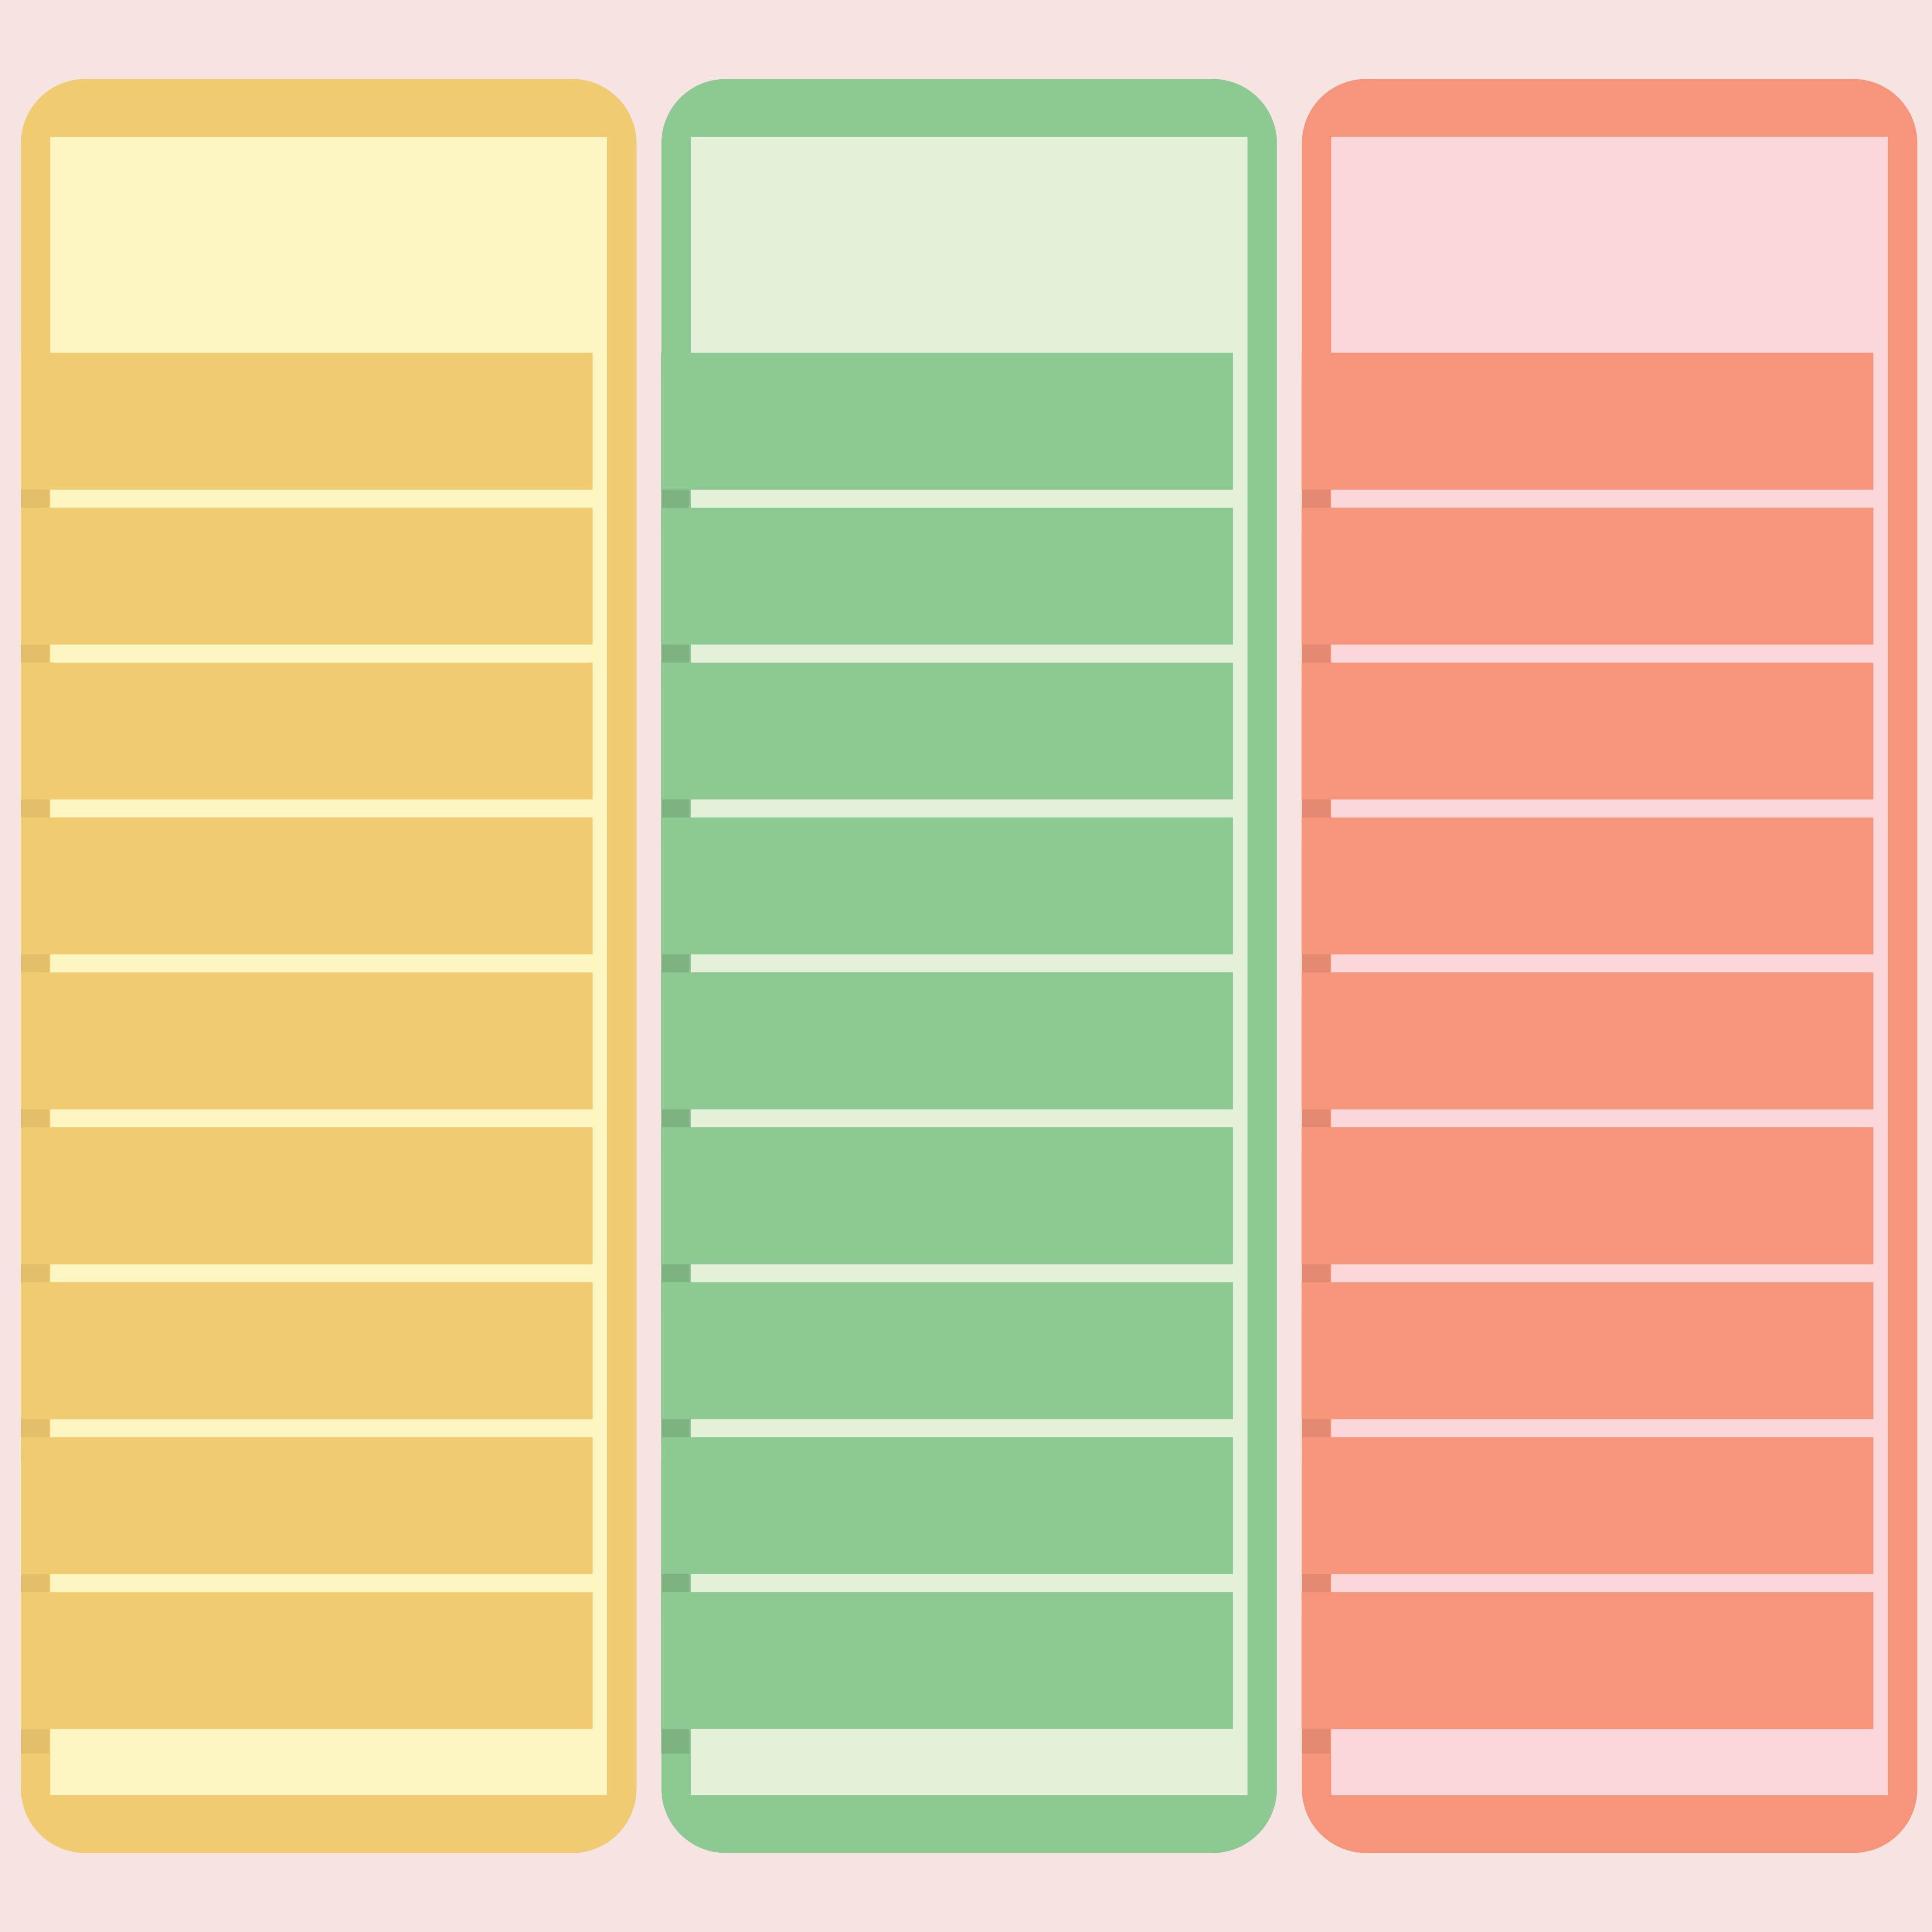 Blank 3 Column Spreadsheet Template